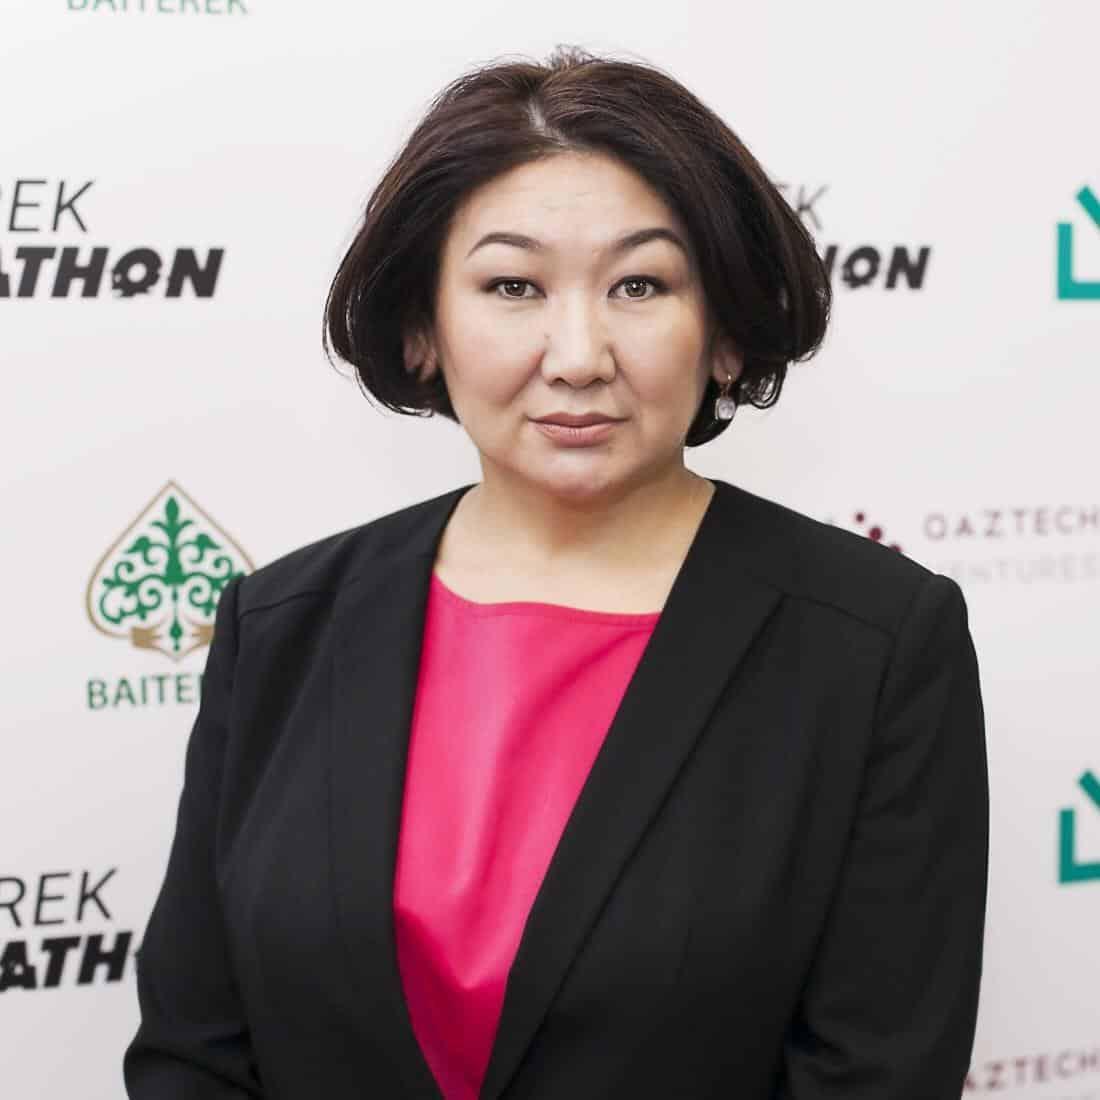 Ләззат Ибрагимова